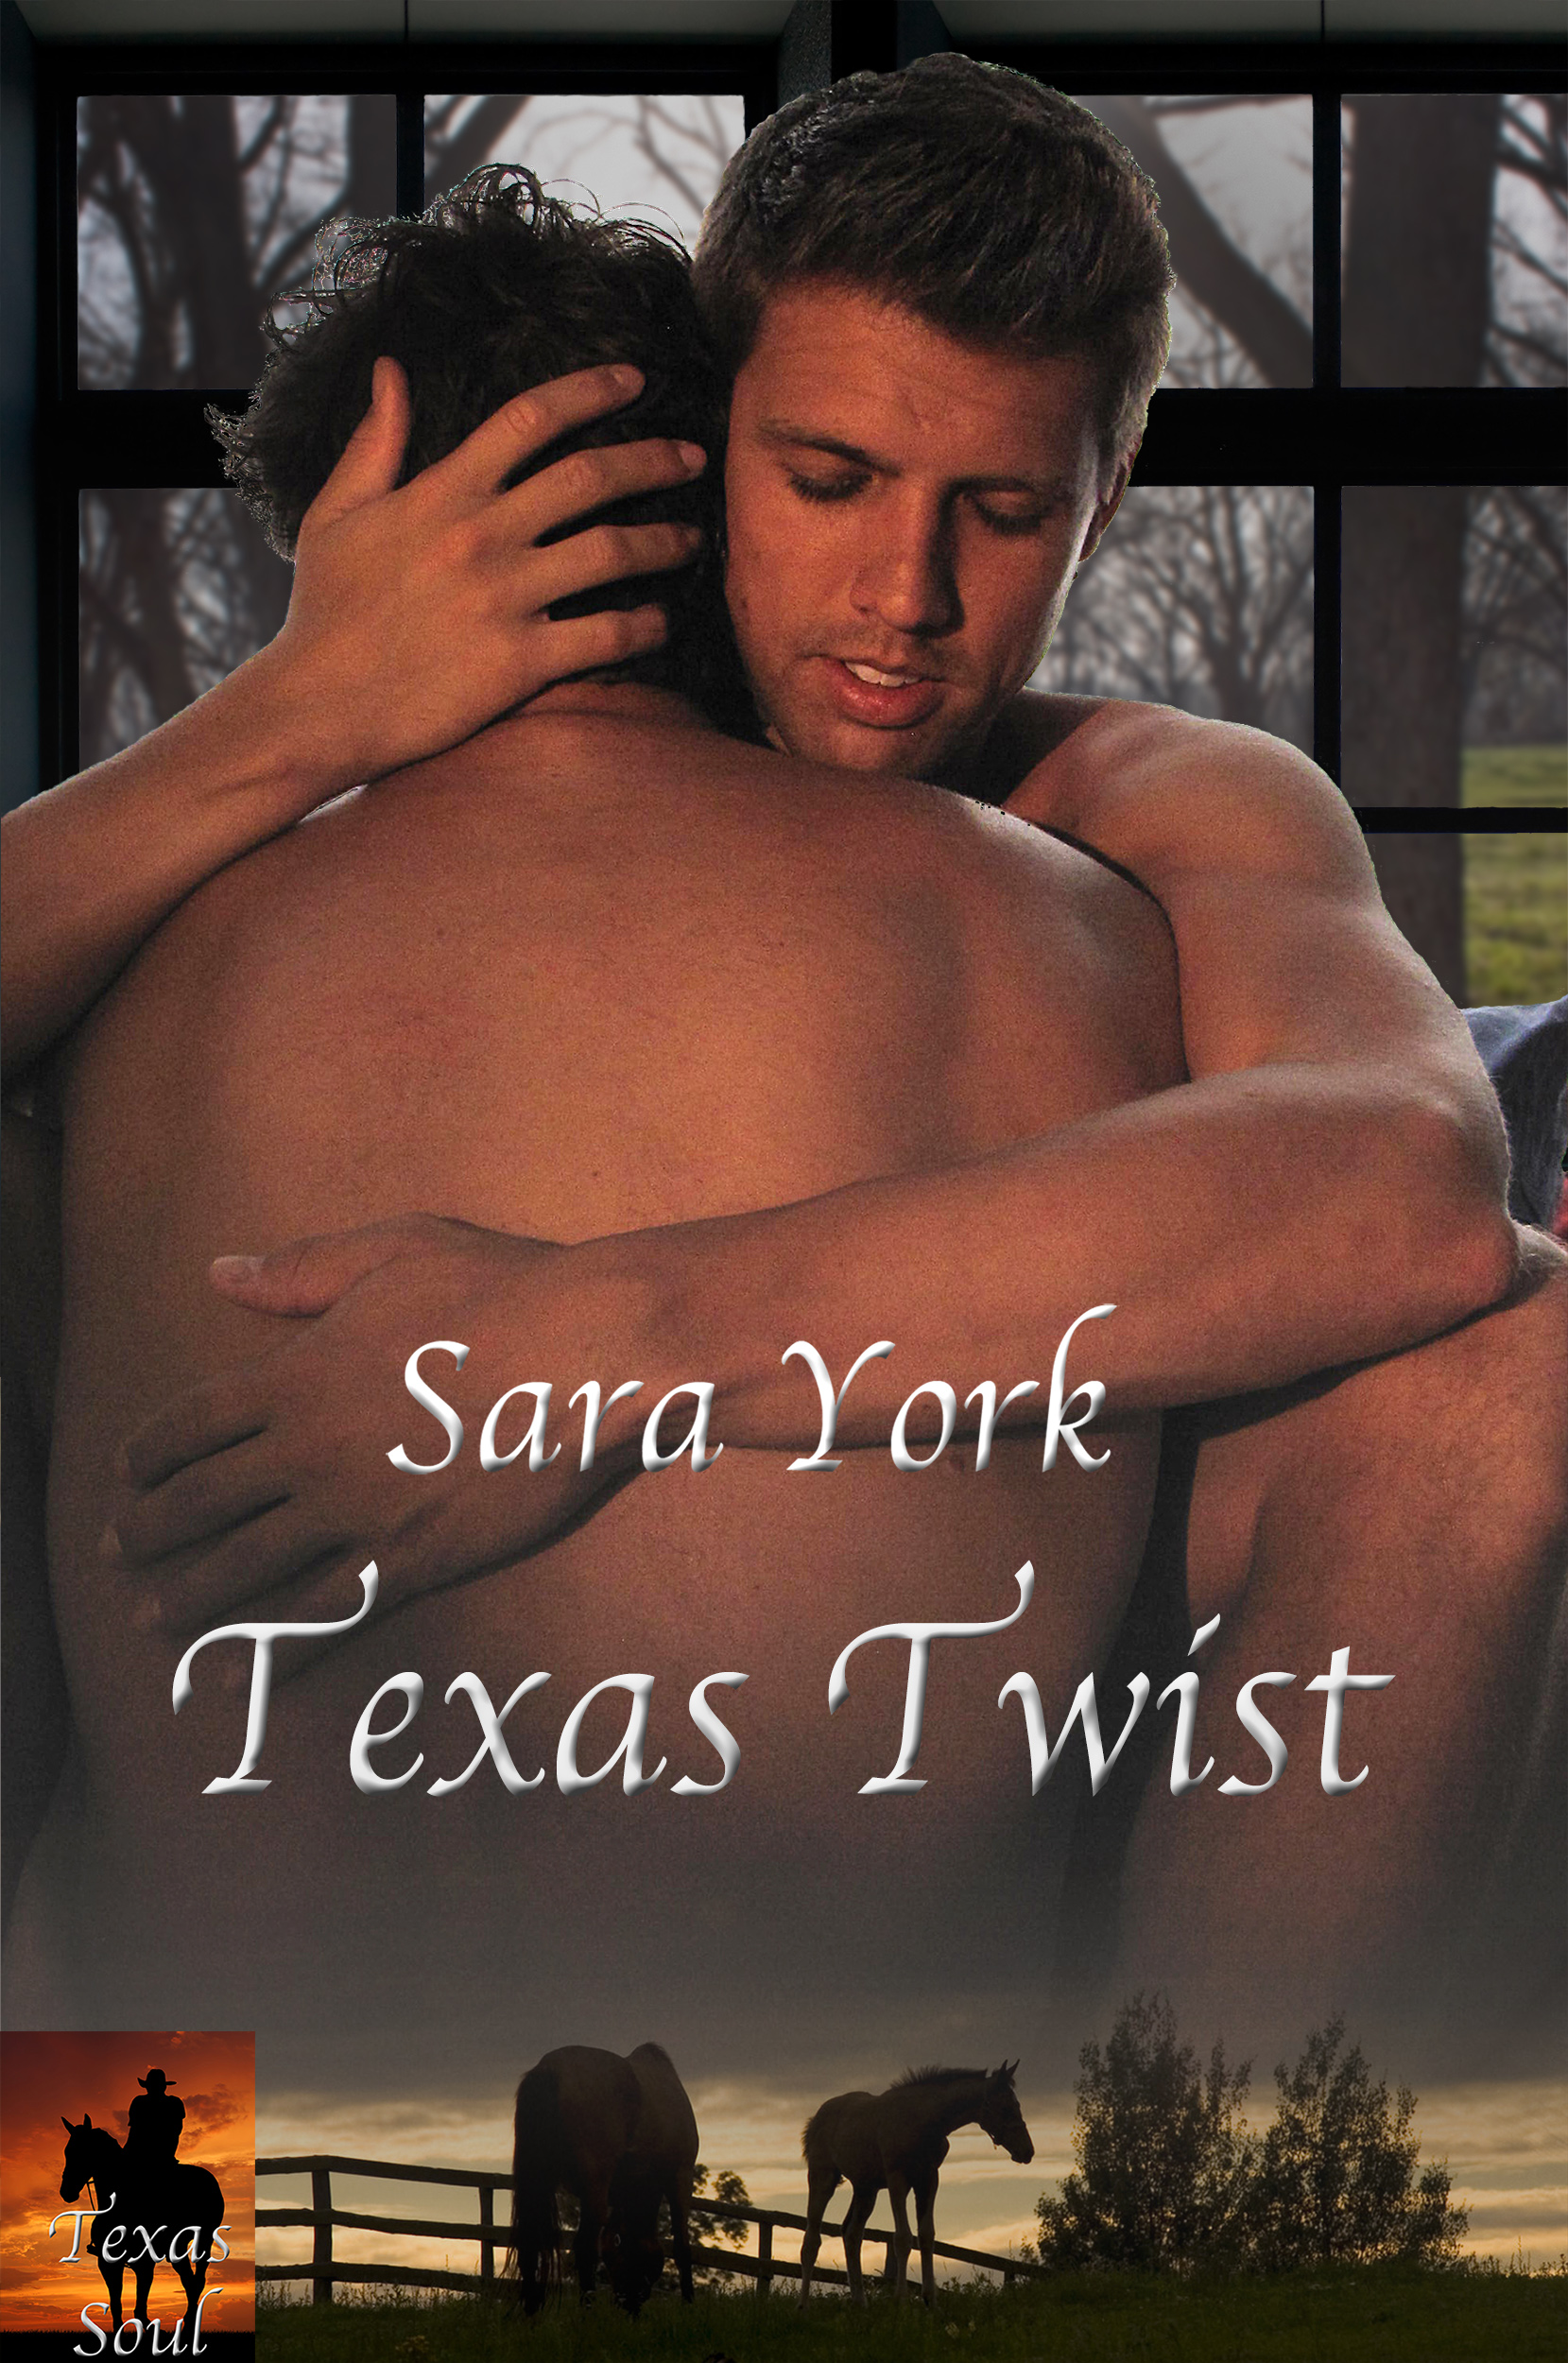 Sara York - Texas Twist